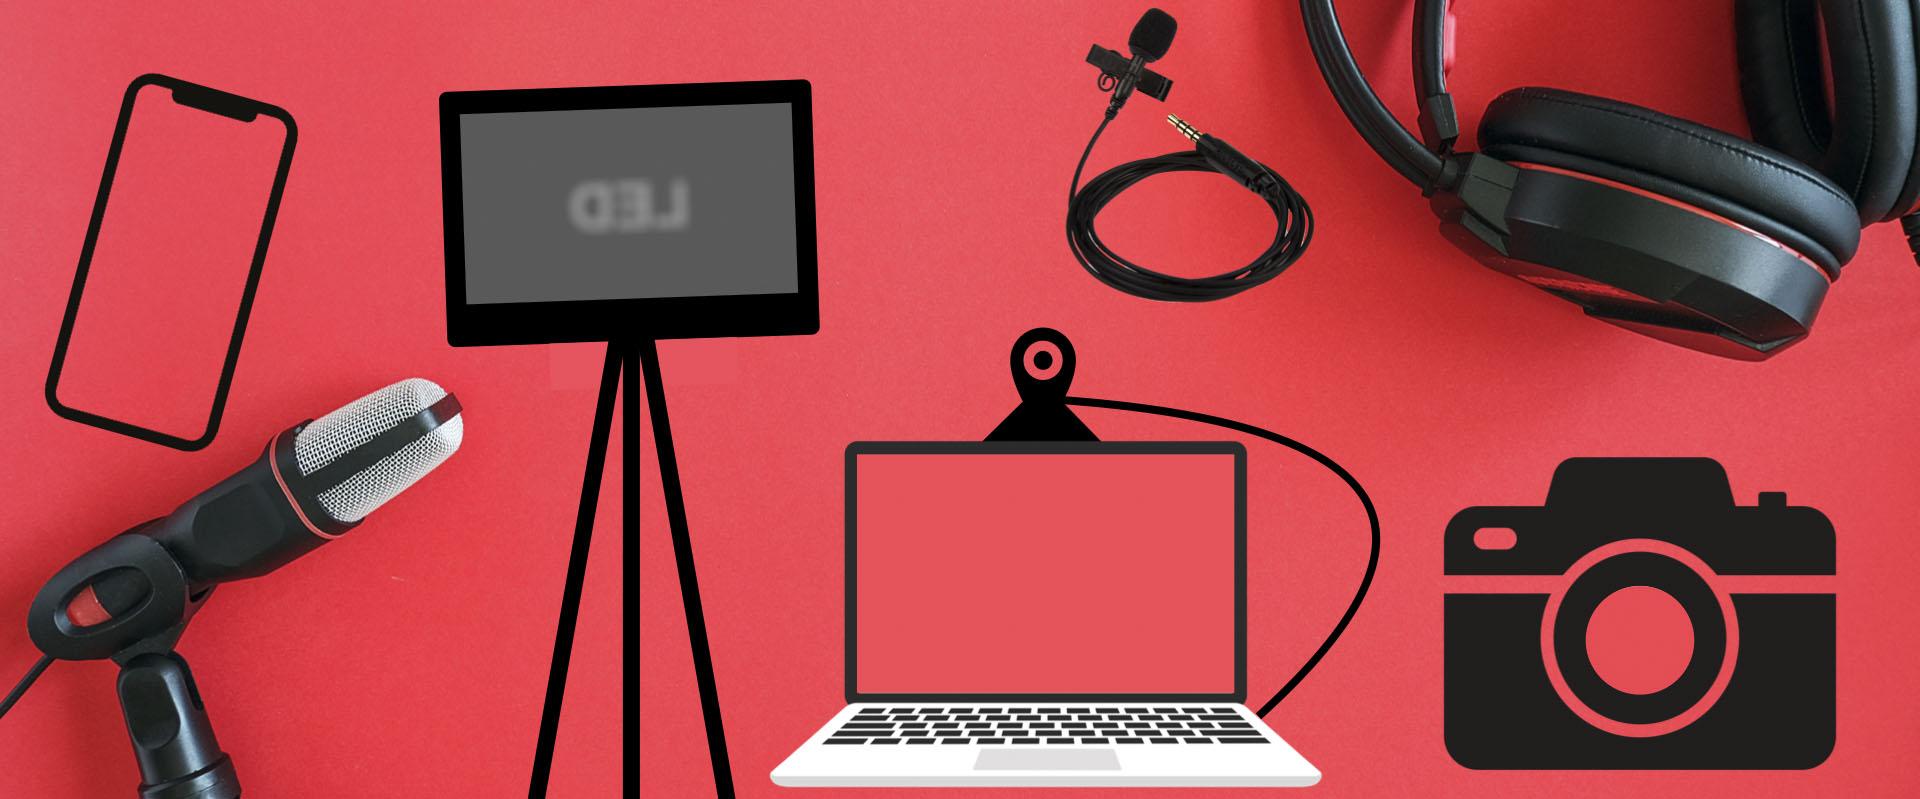 Onlinekurs Webbseminarium - Tekniken i rummet